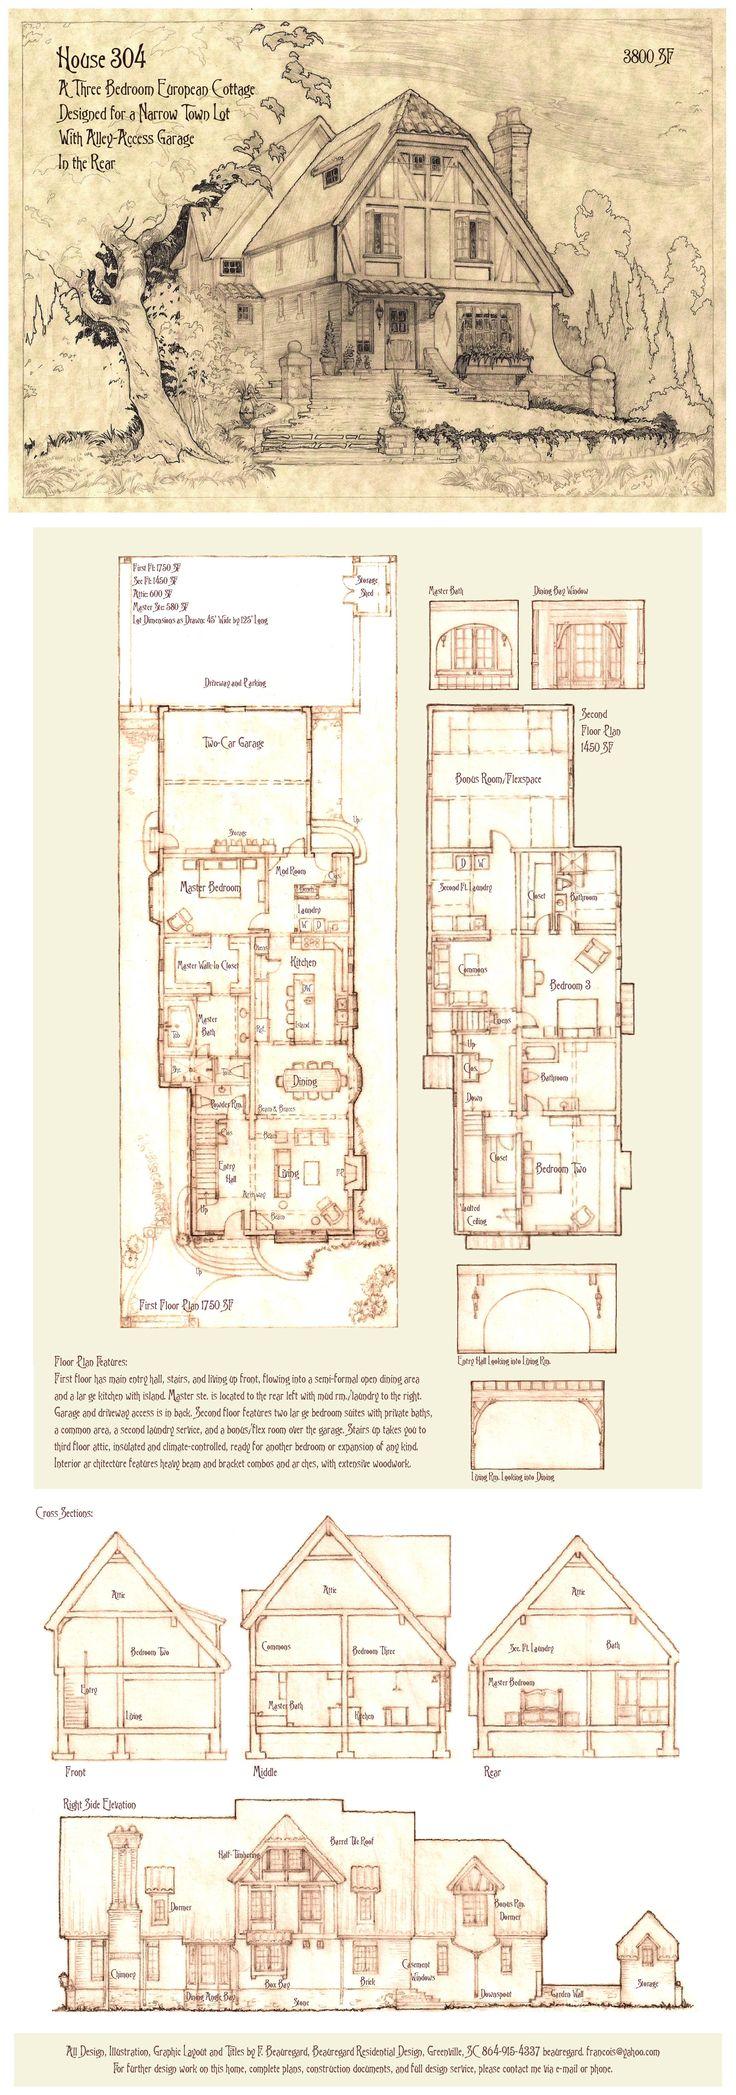 House 304 portrait and plans by built4ever deviantart com on deviantart